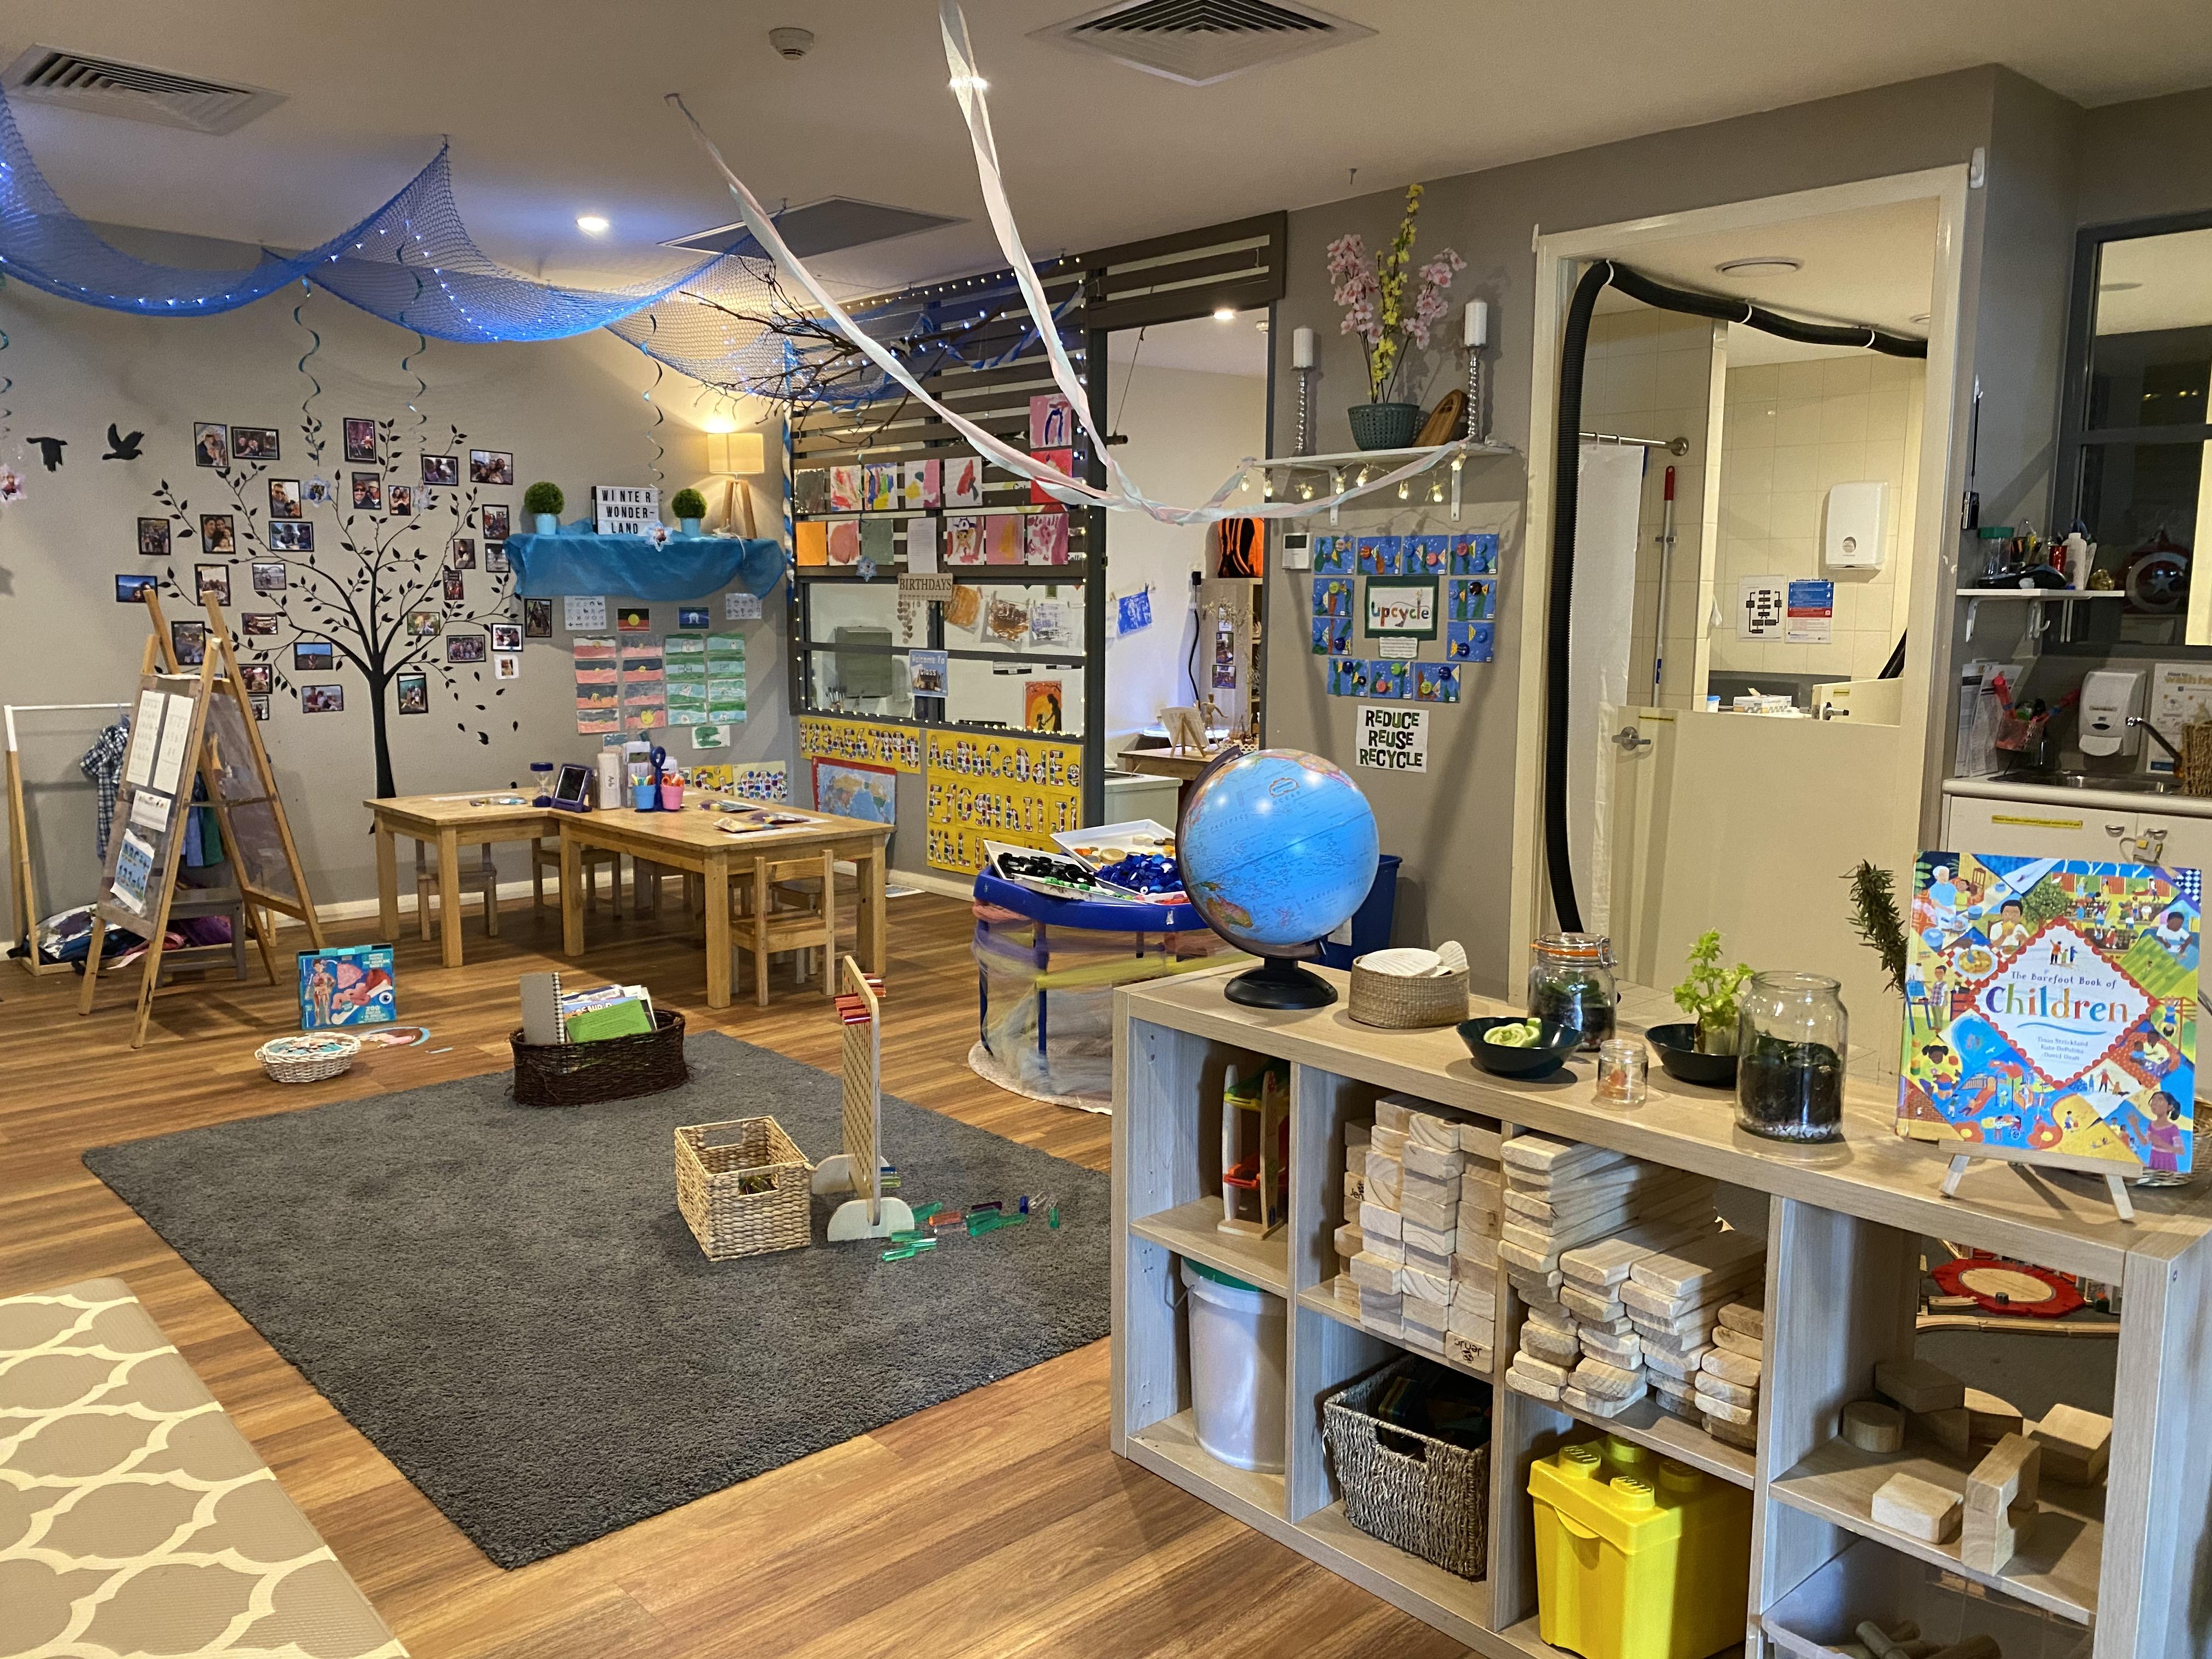 Lewisham Learning Centre Bookshelf and Play Rug